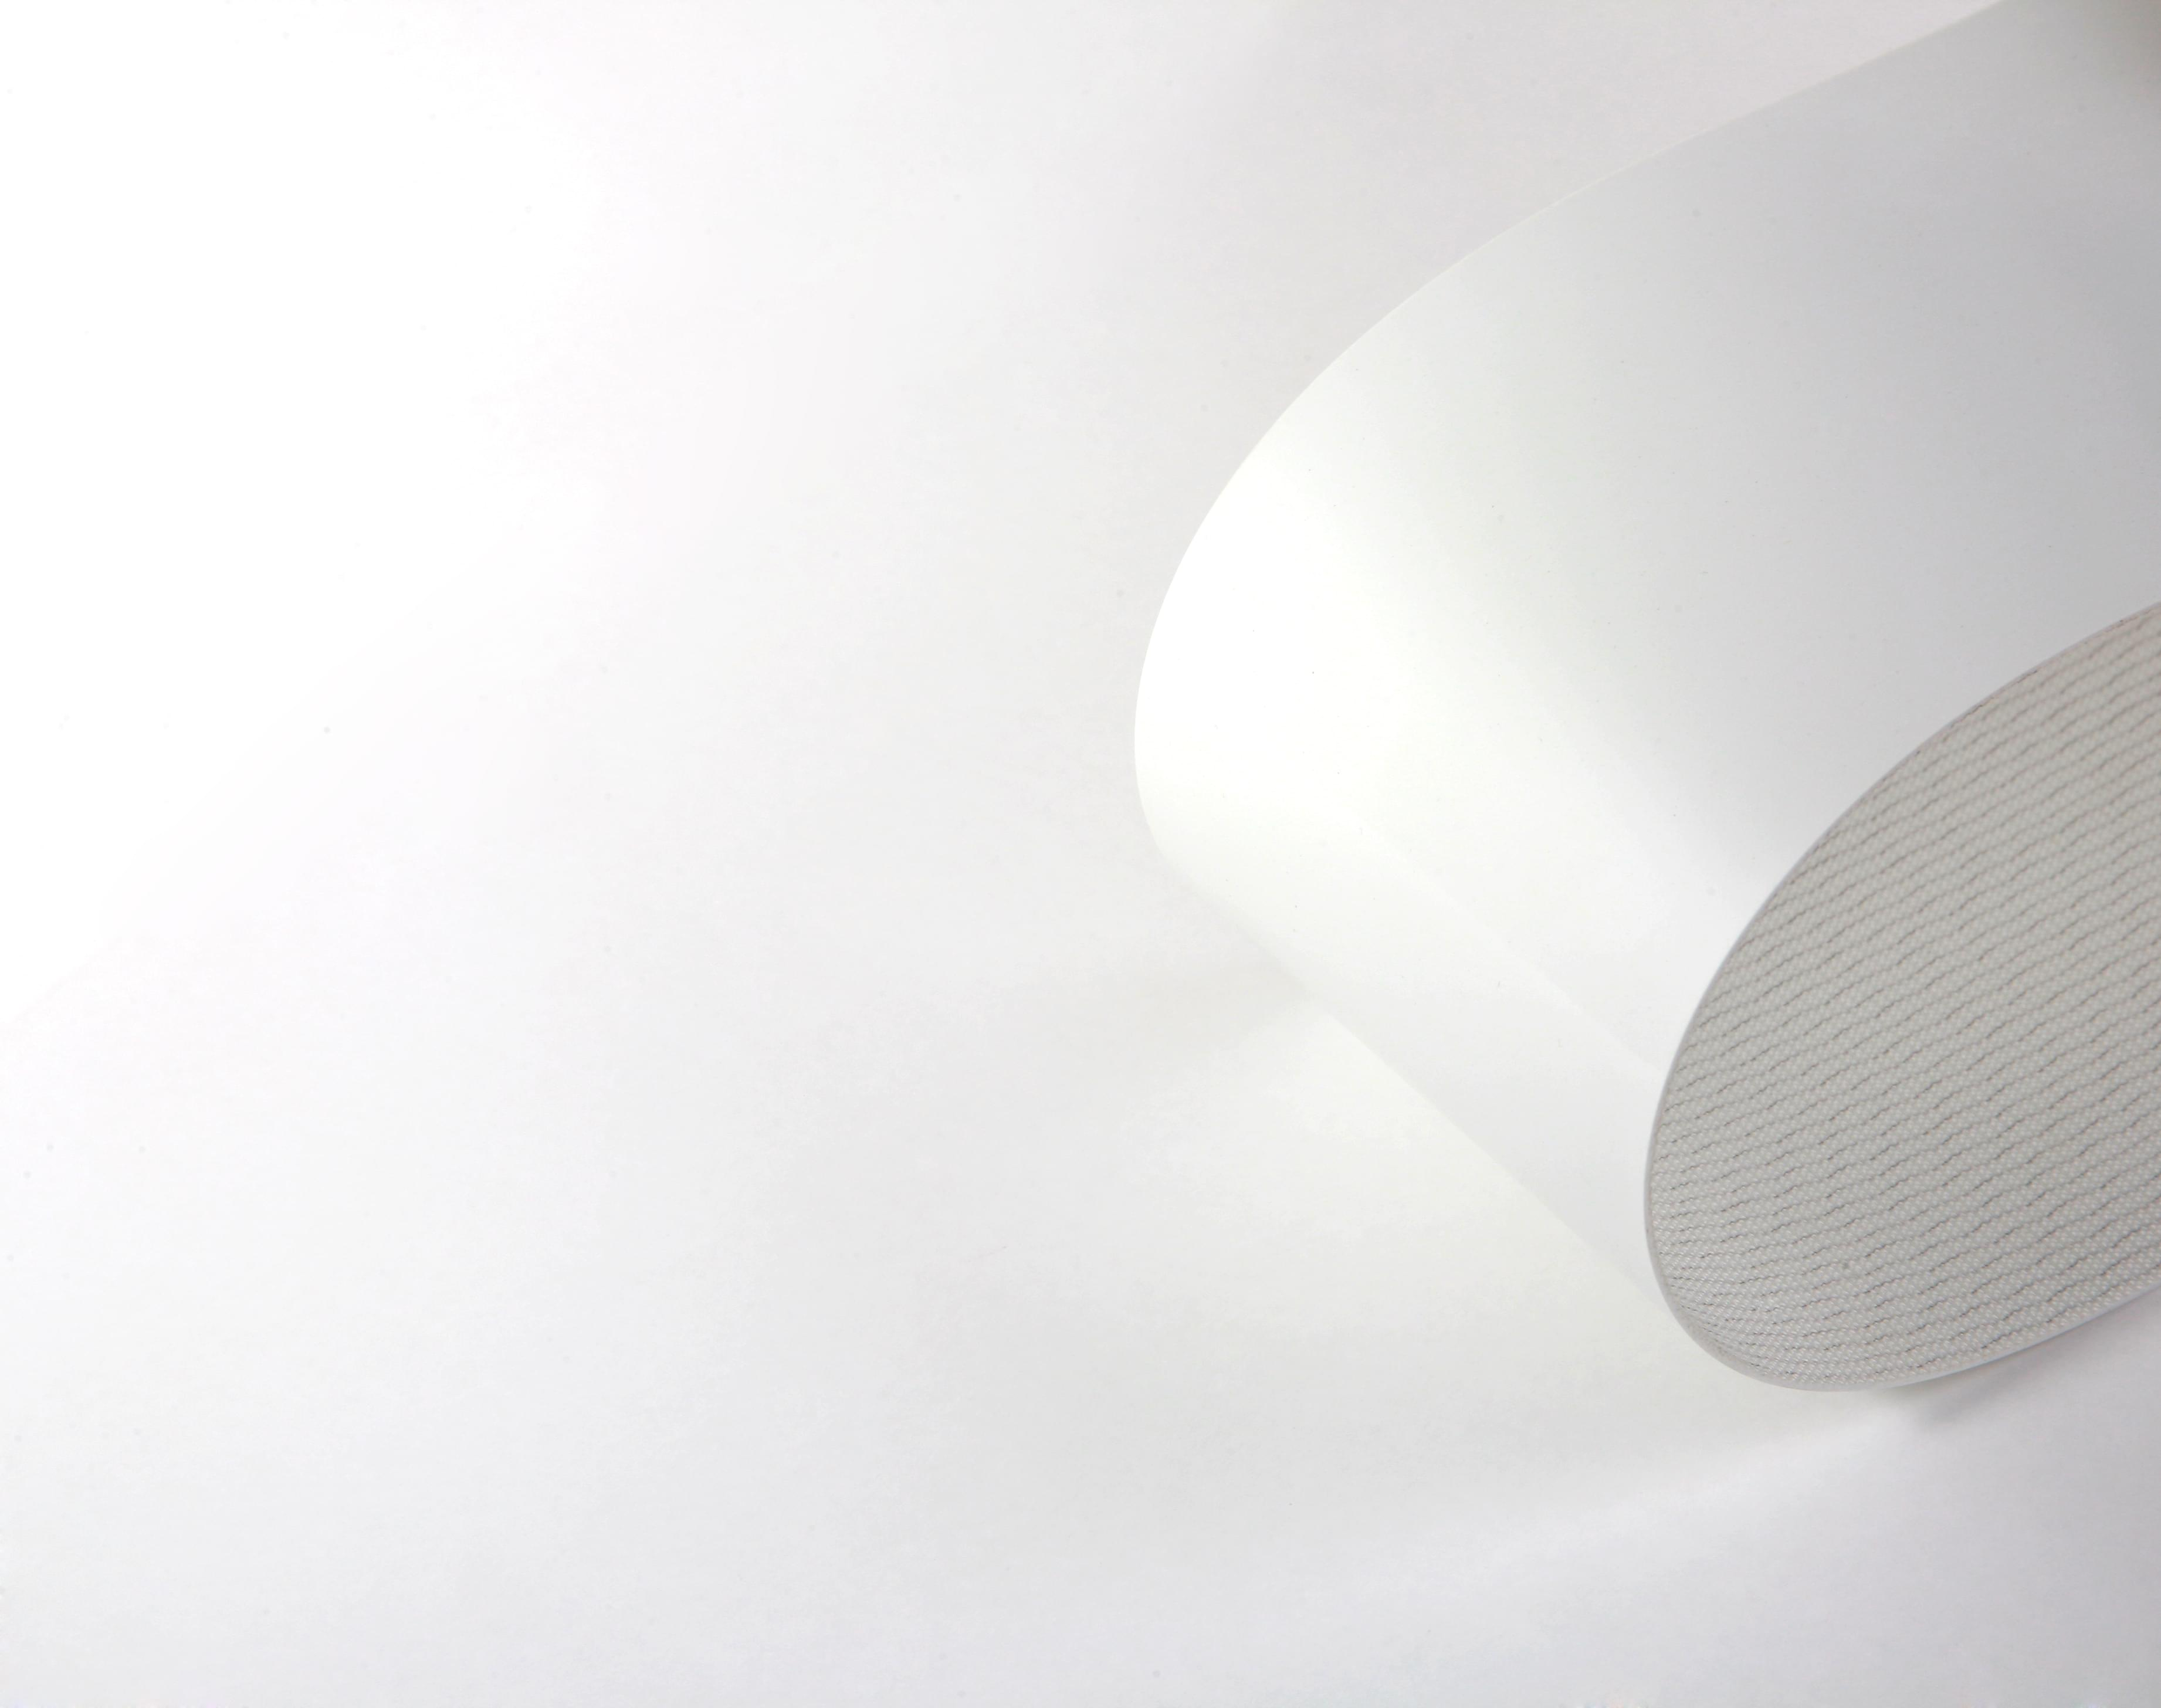 correia Poliuretano (PU) (poliuretano) branco uma lona